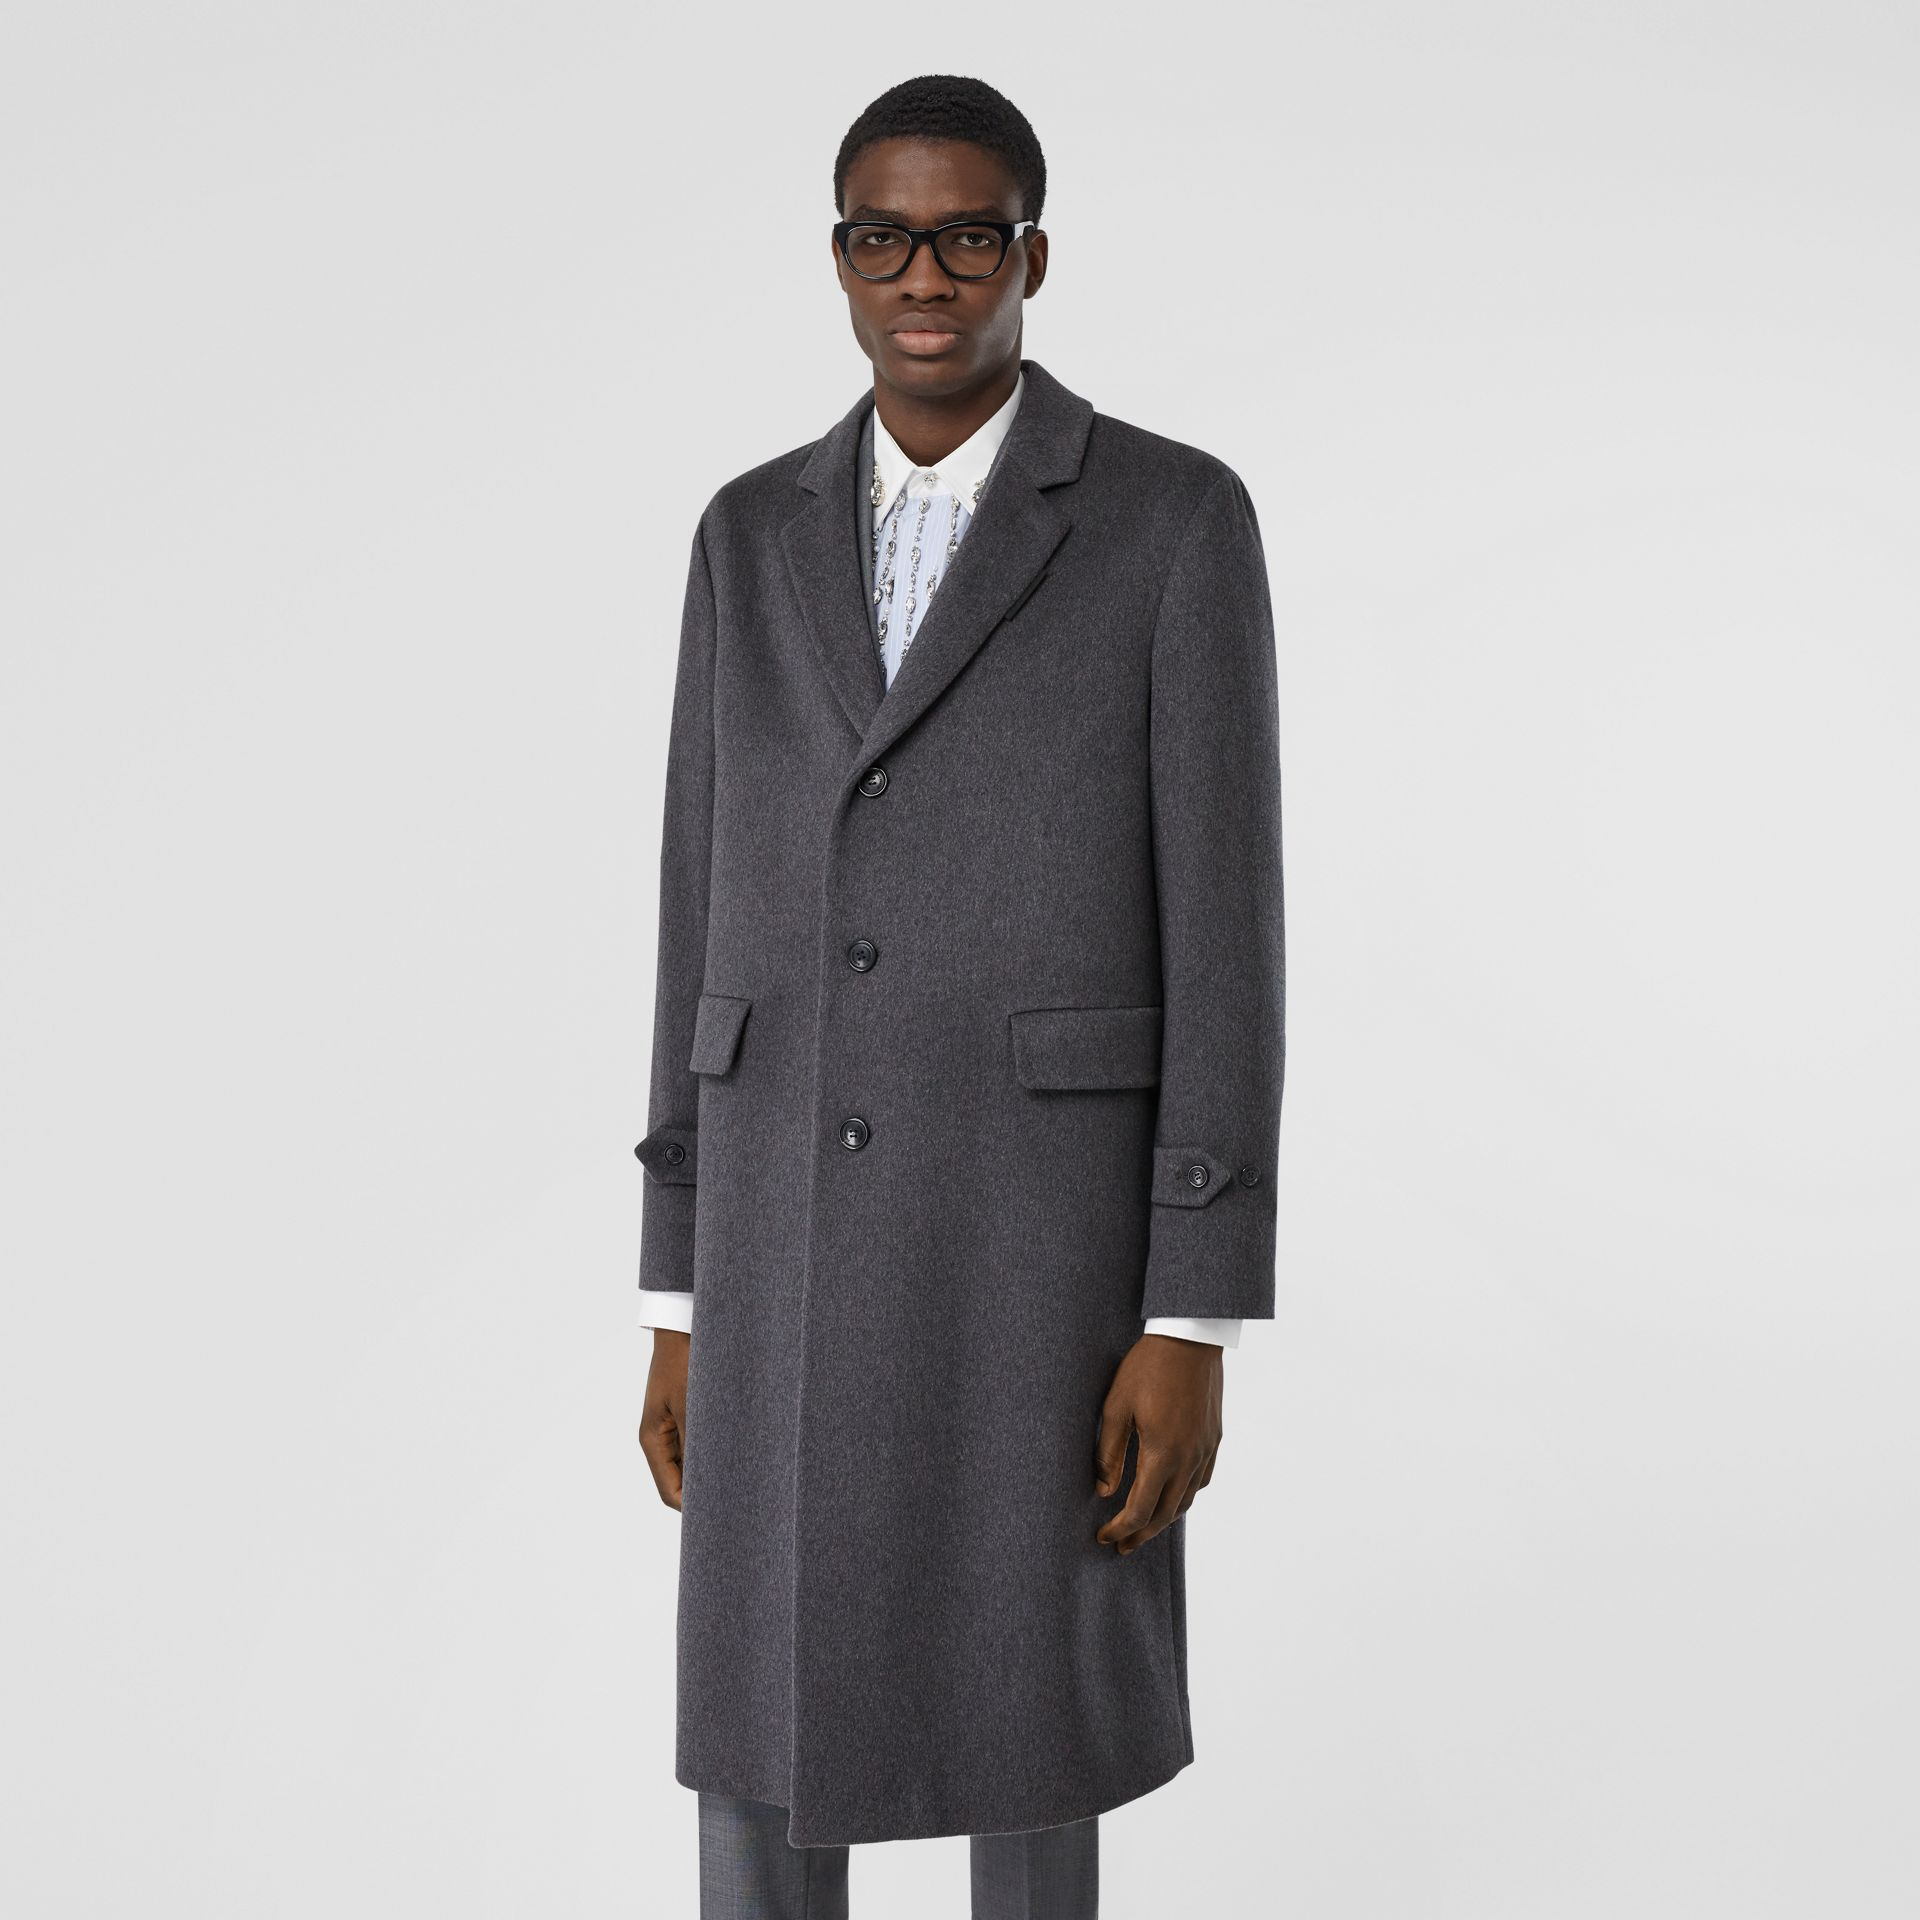 Cashmere Lab Coat in Pewter Melange - Men   Burberry - gallery image 5